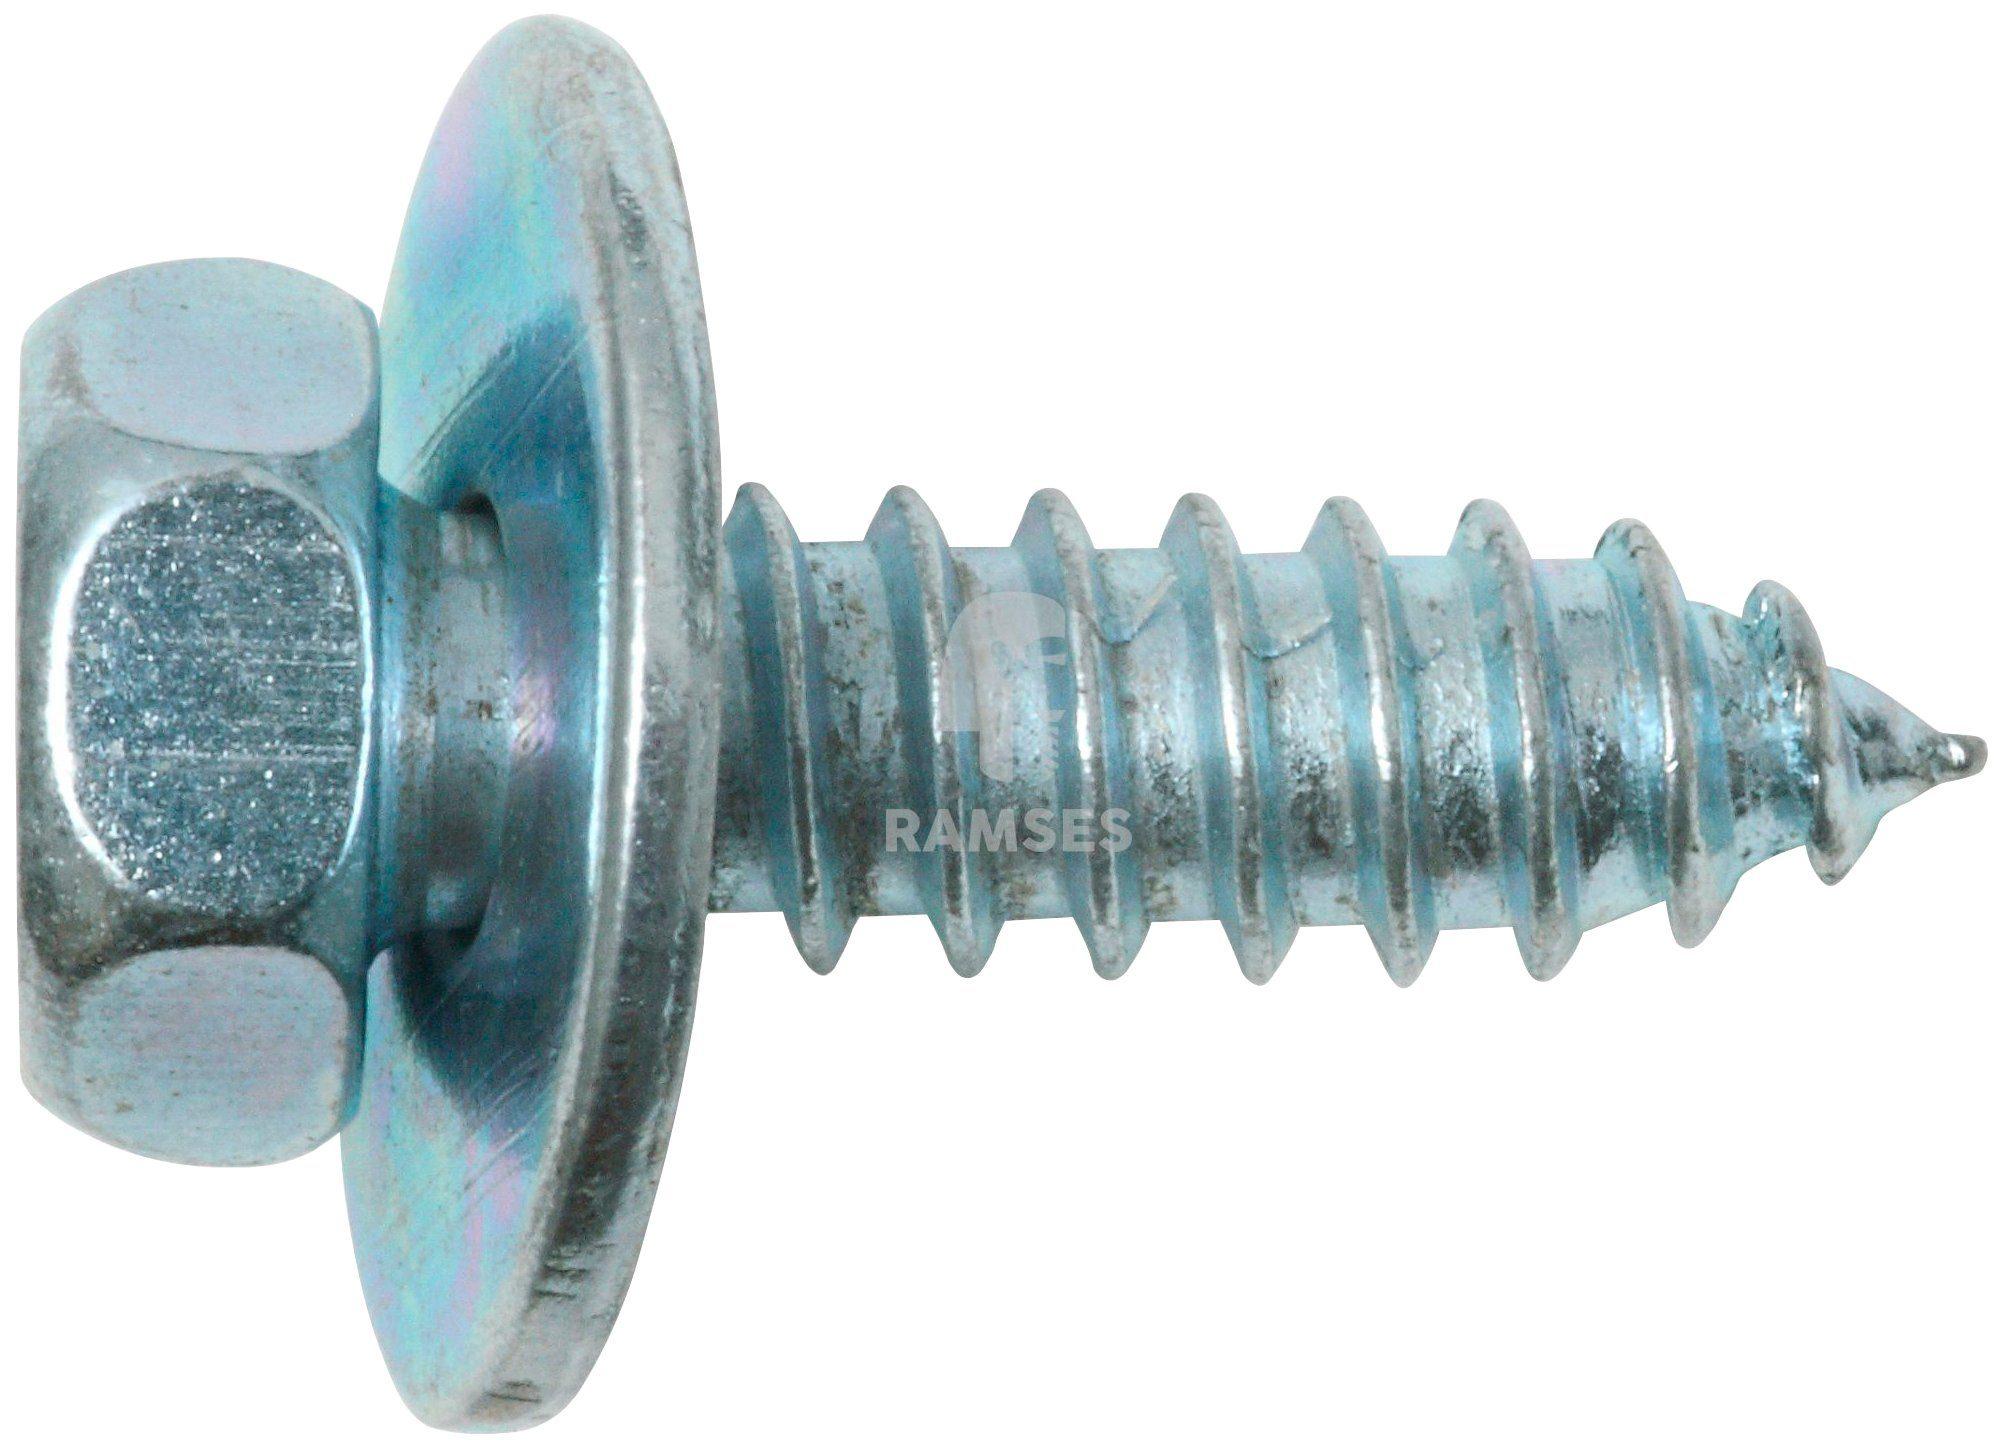 RAMSES Schrauben , Kombi Blechschraube 5,5 x 16 mm SW8 100 Stk.